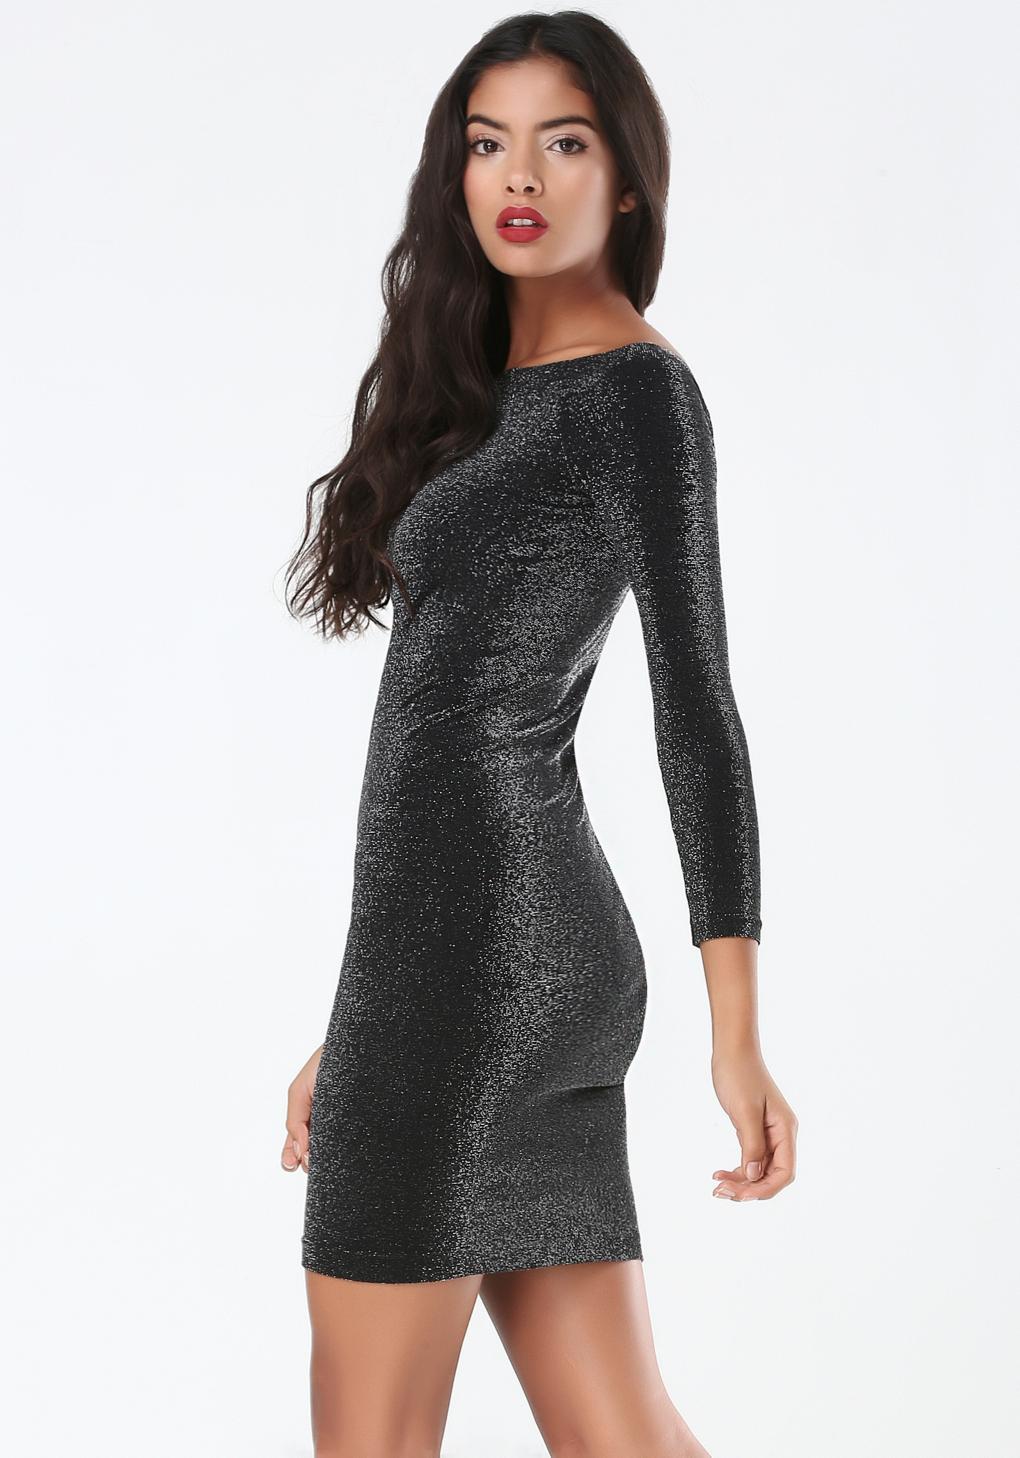 Bebe Shimmer Dress In Black Lyst